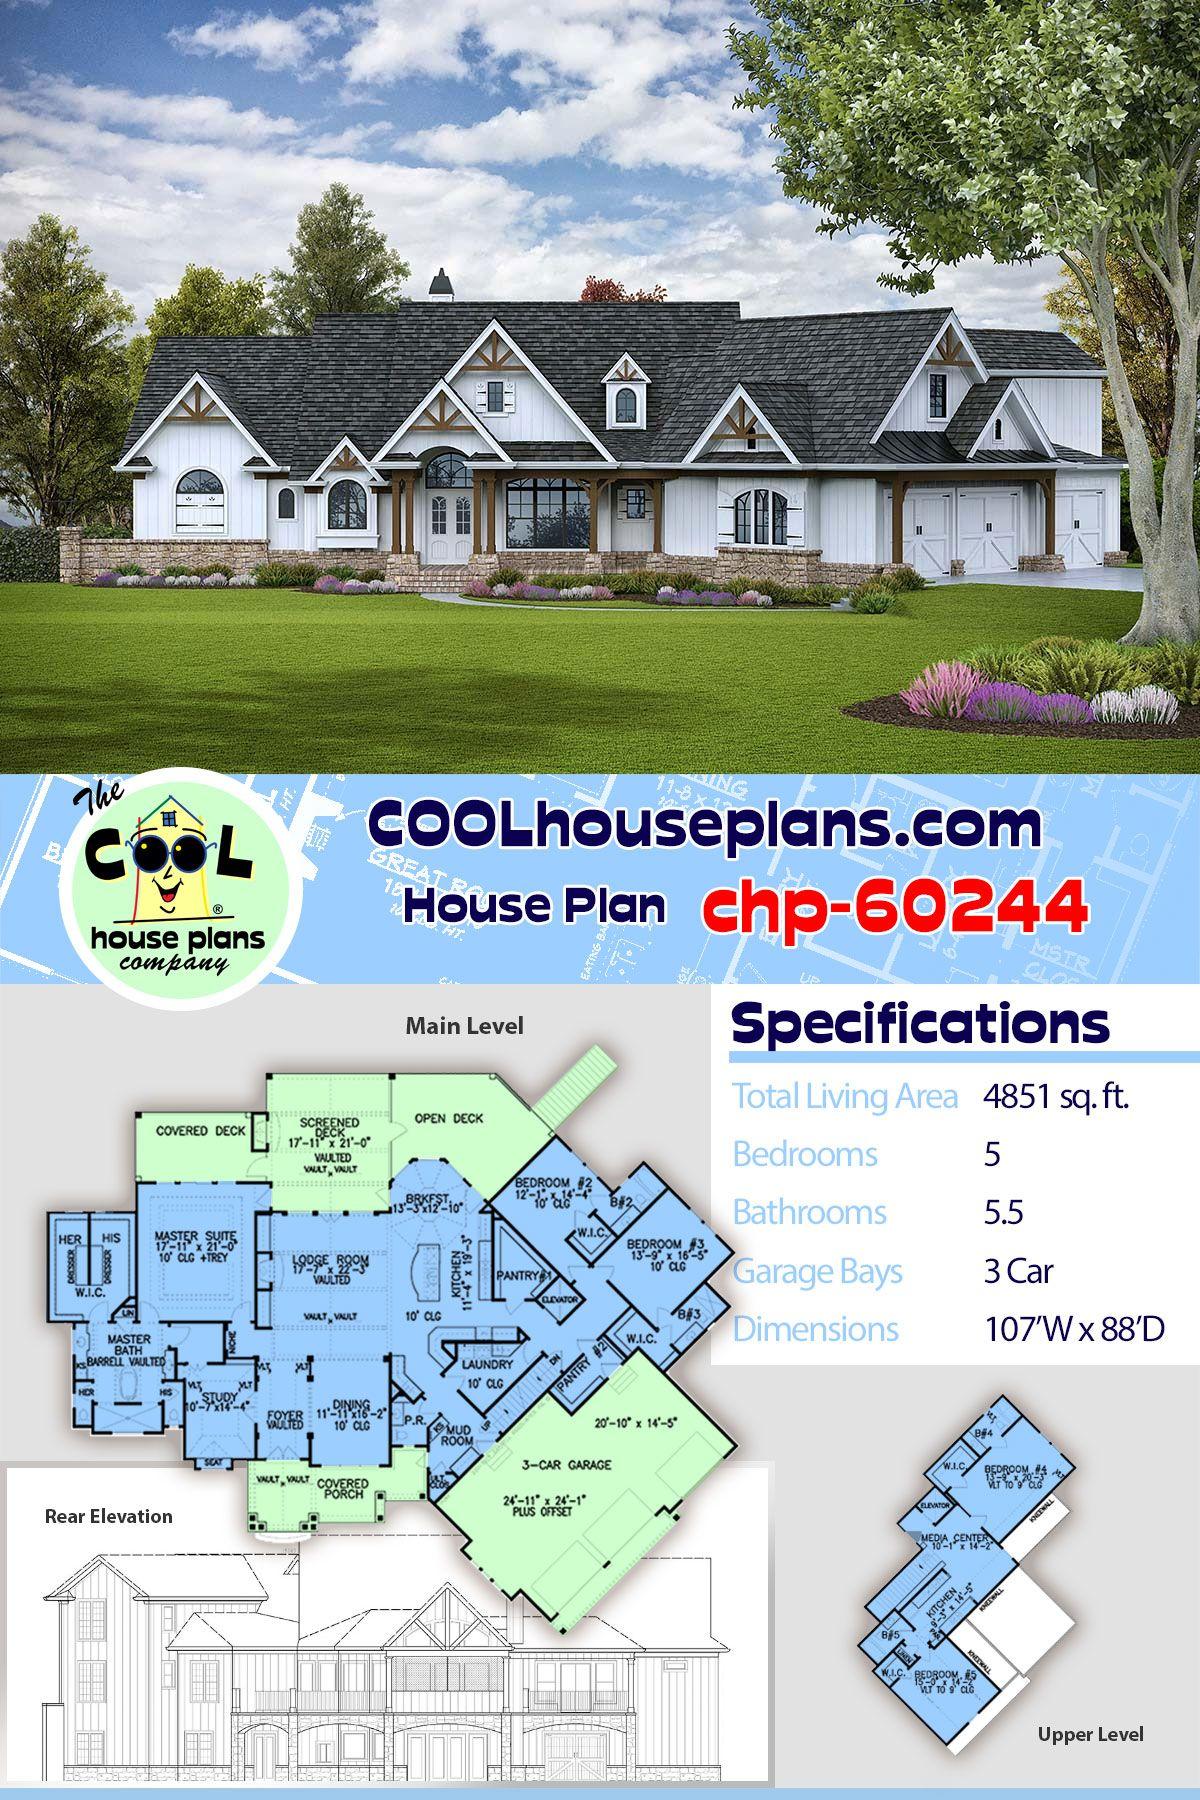 Luxury Craftsman House Plan chp-60244 | Large Five Bedroom Home Floor Plan